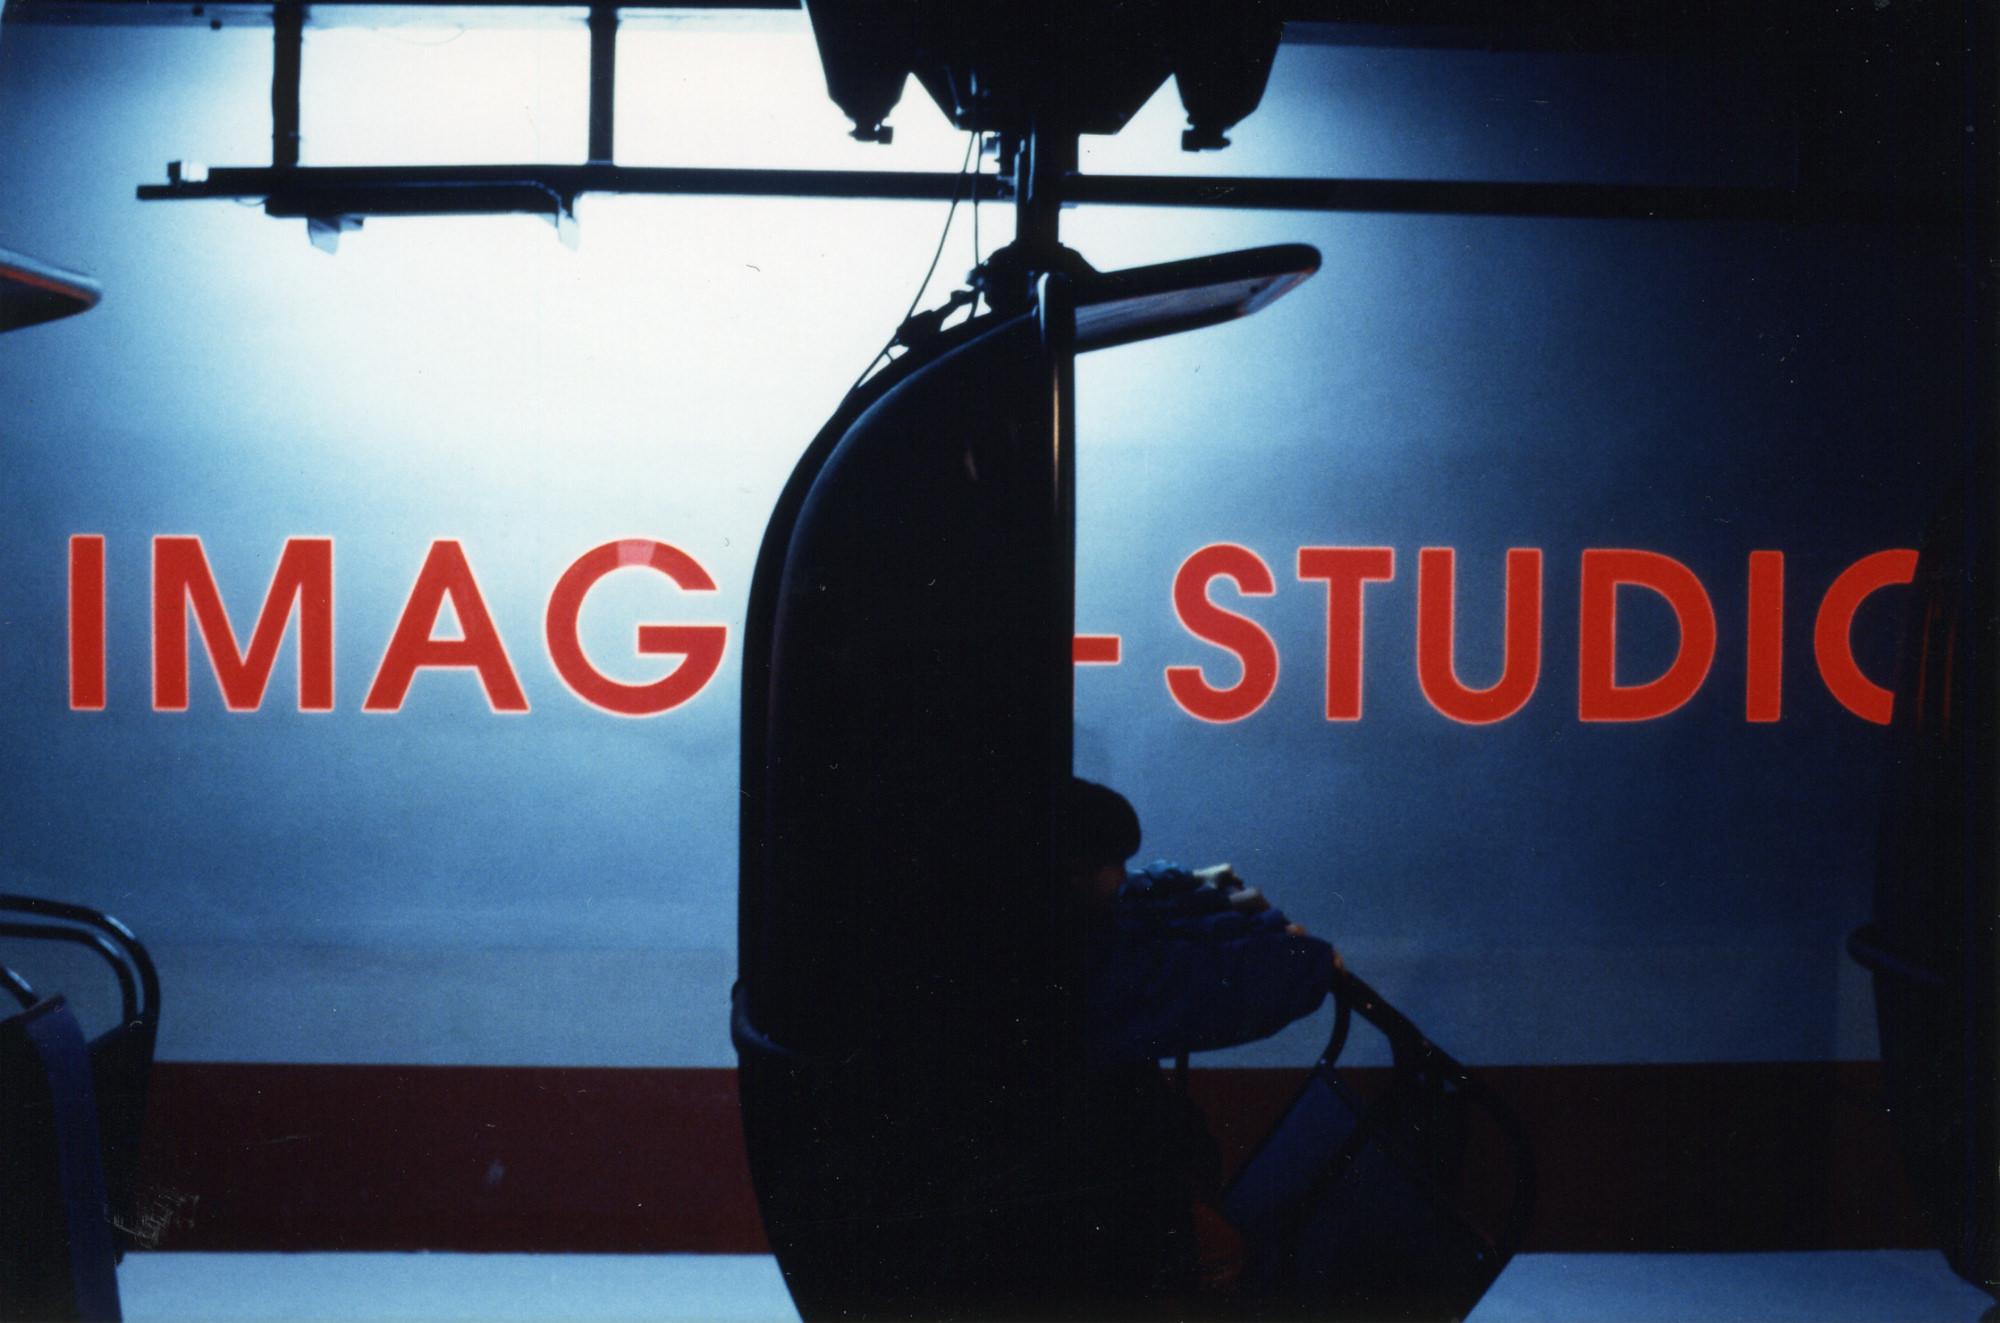 image-studio032